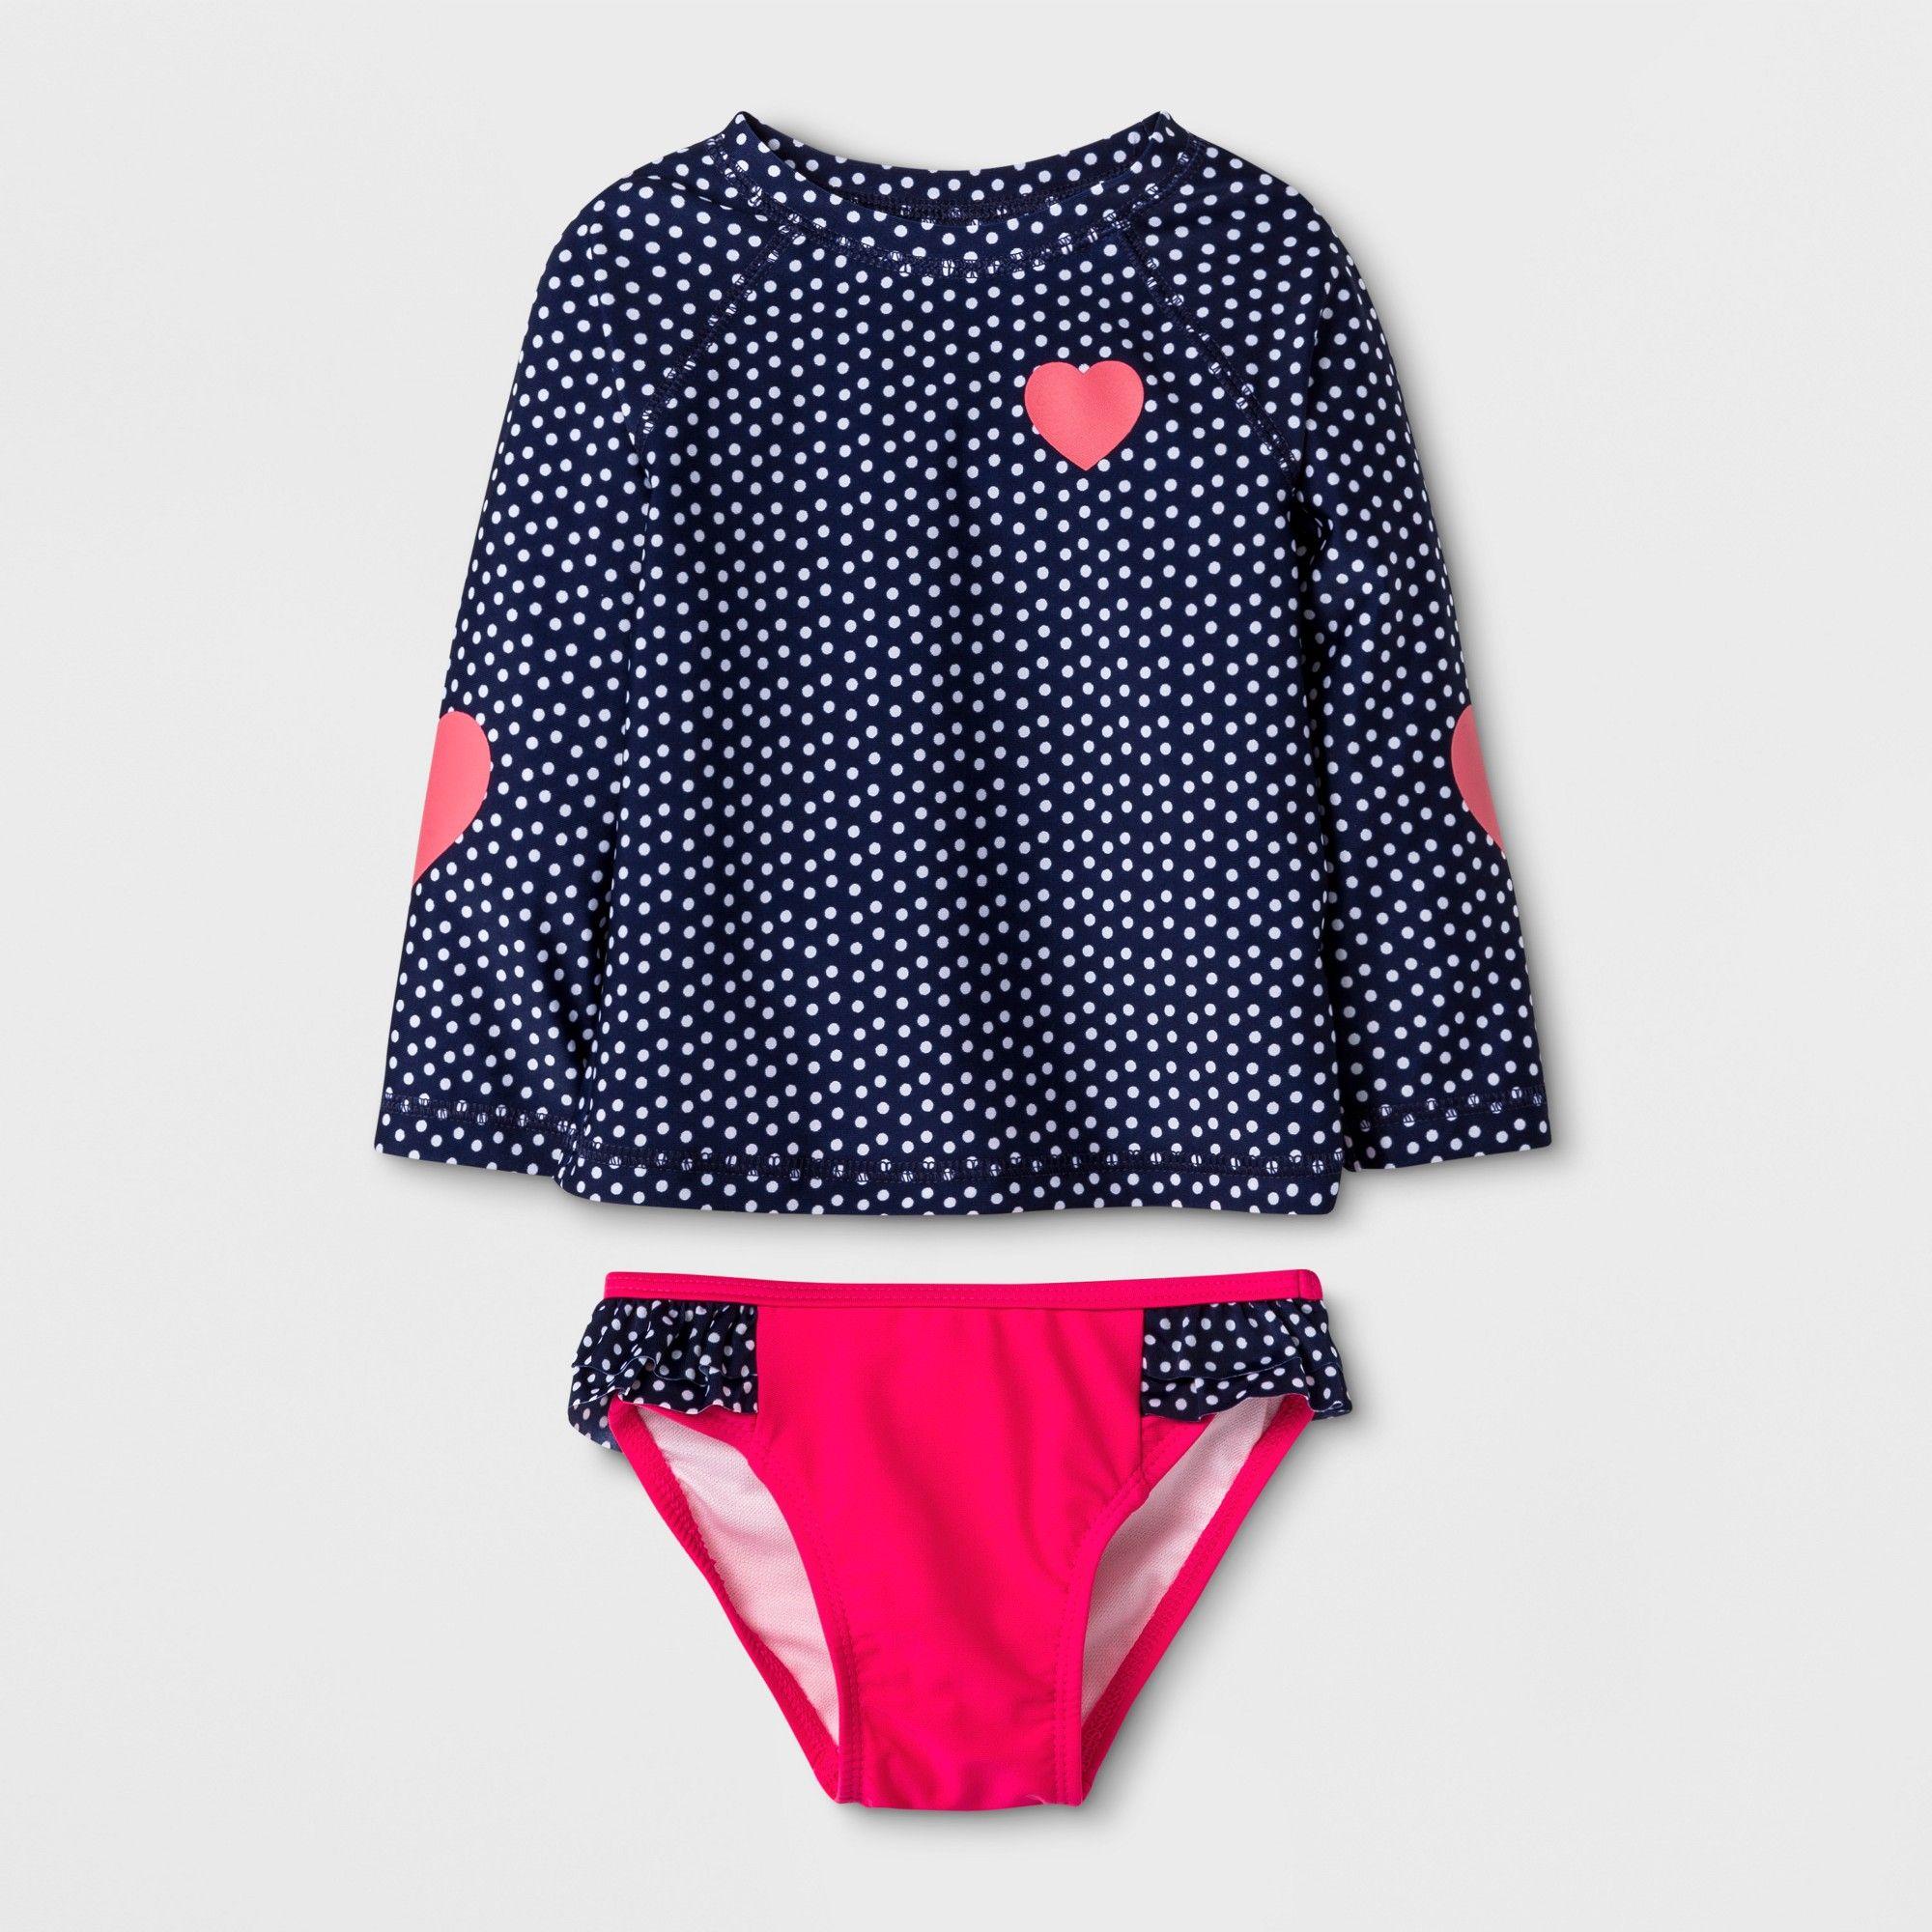 7182a088214b4 Baby Girls' Long Sleeve Polka Dot Rash Guard Set - Cat & Jack Navy 12M, Blue